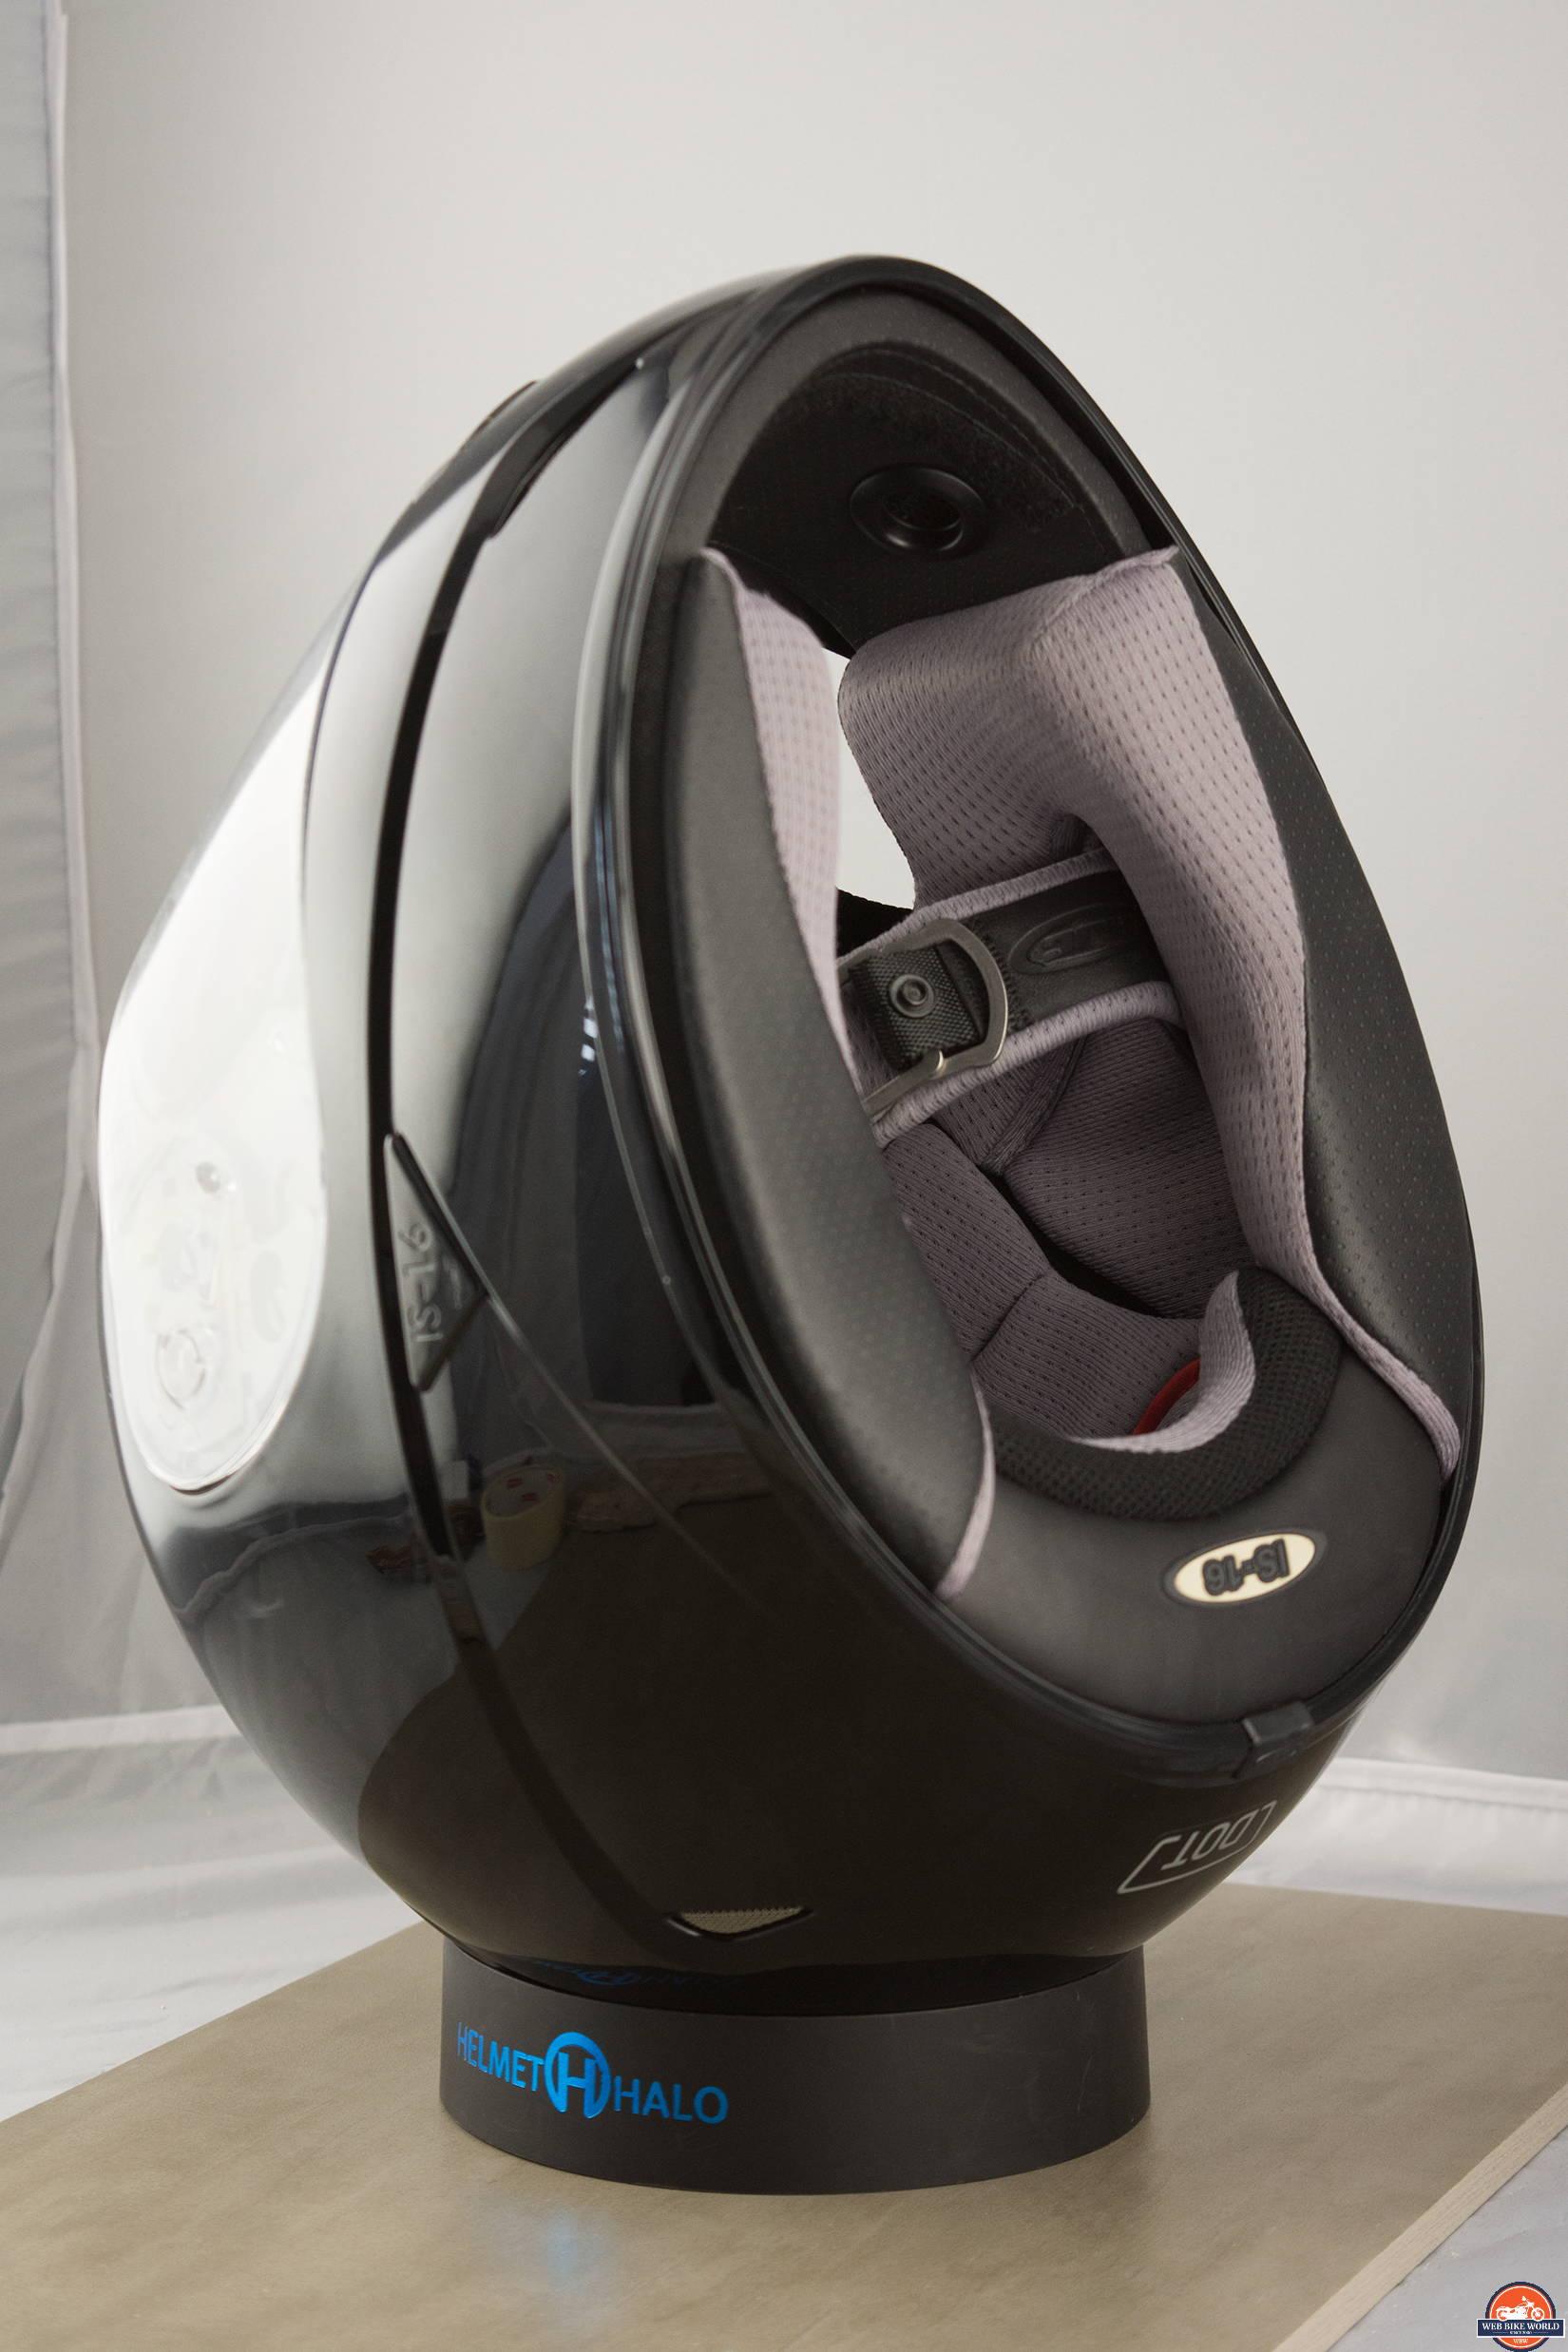 Helmet Halo Portable Helmet Stand